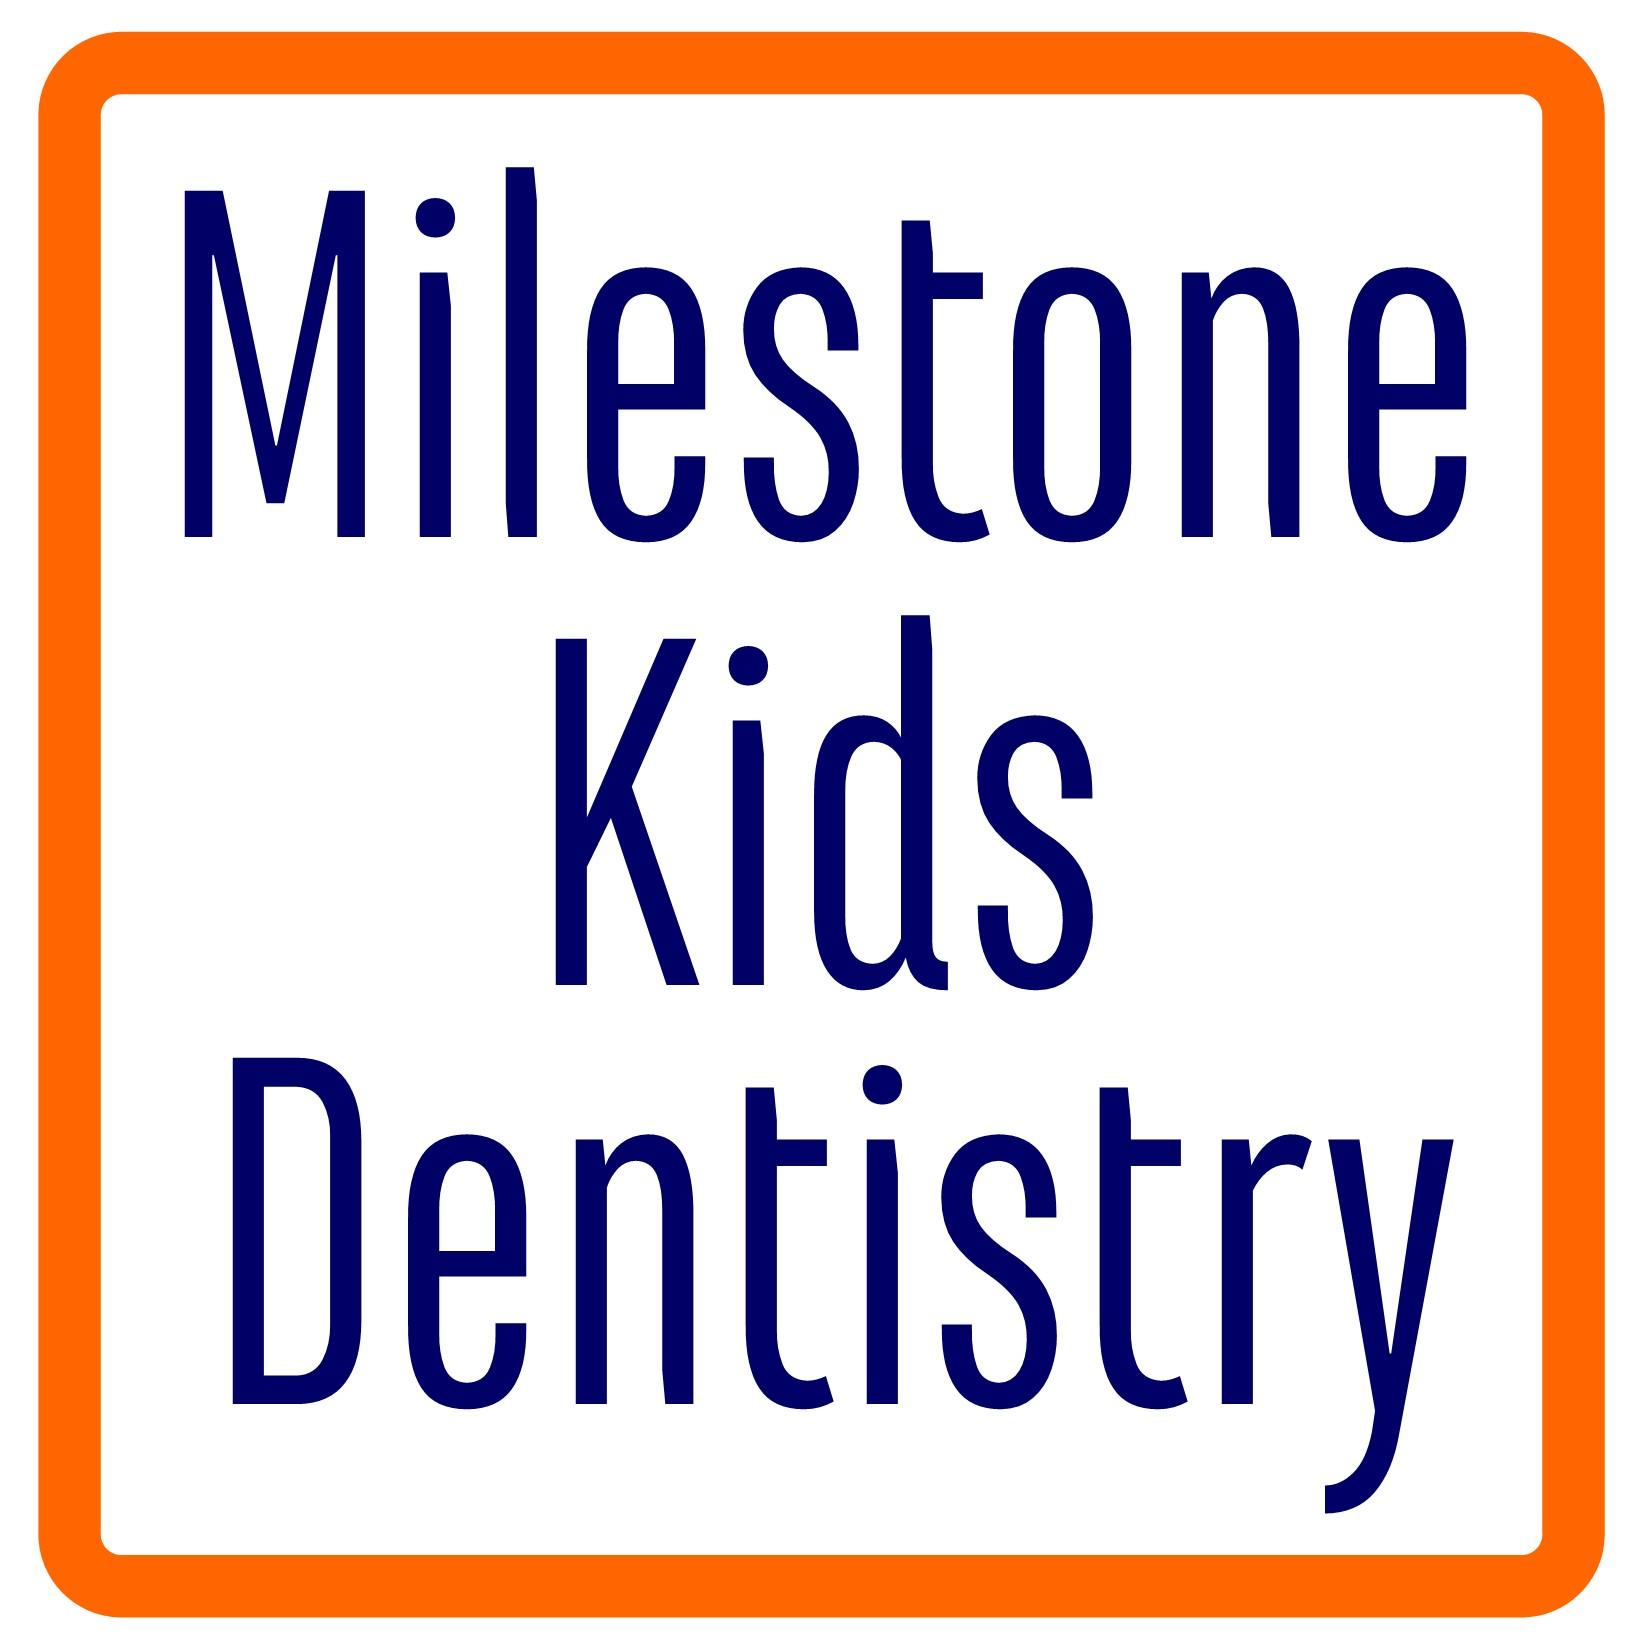 Milestone Kids Dentistry